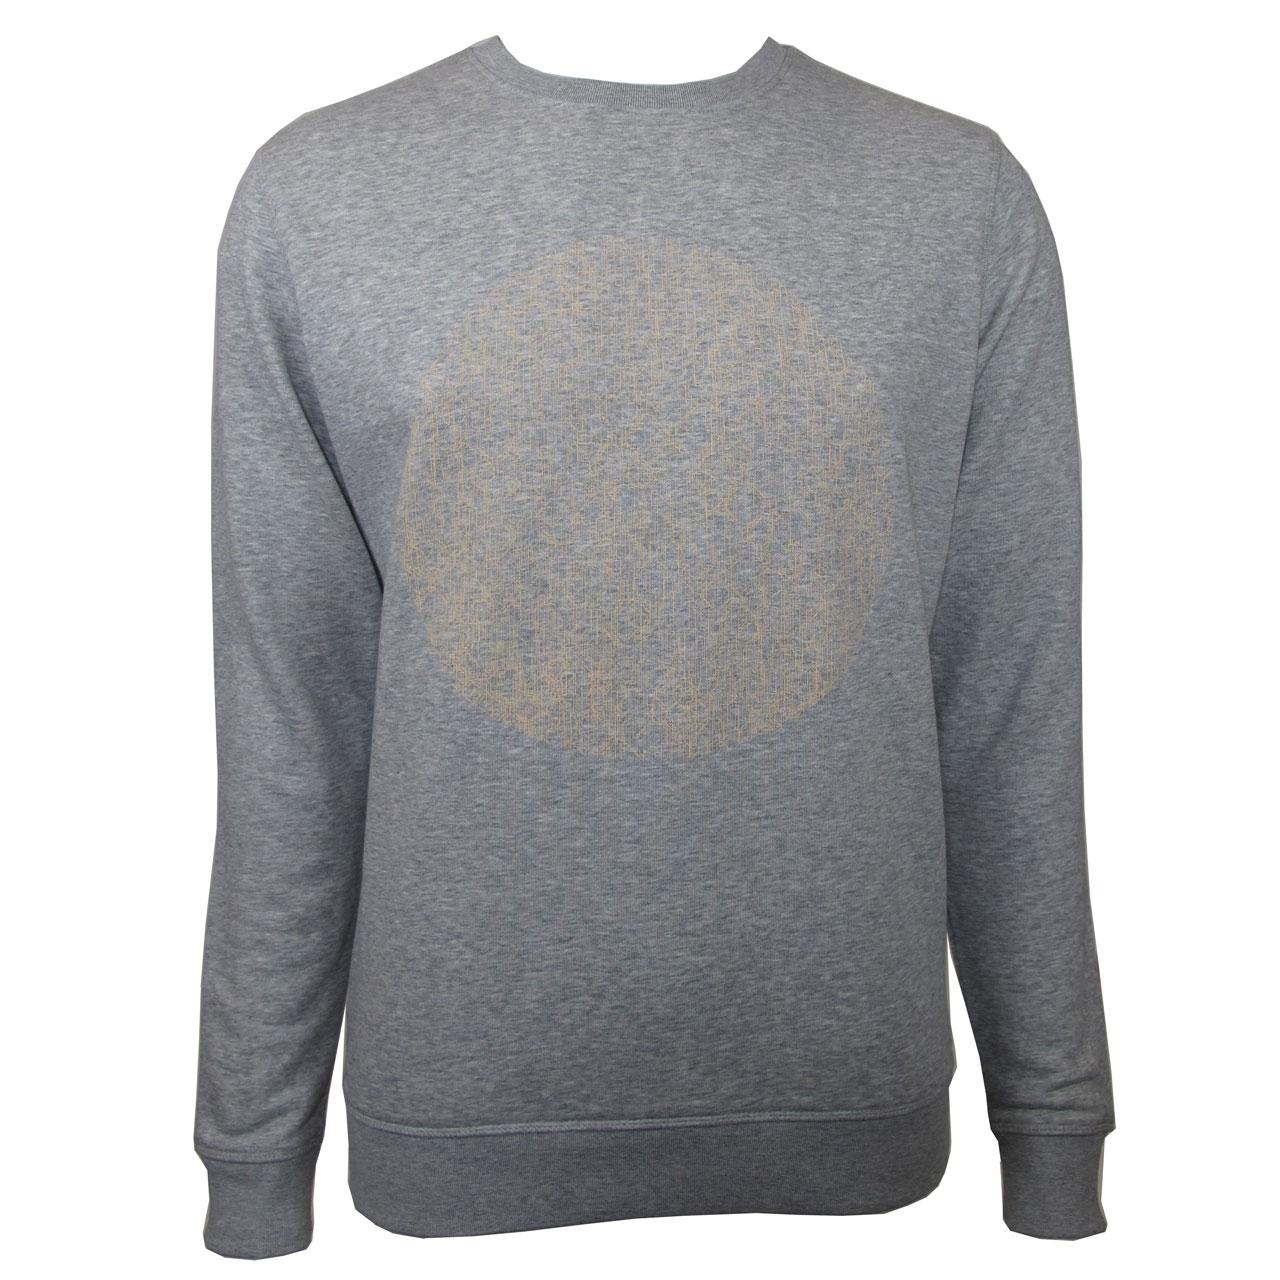 Berlin Design Sweatshirt Fernsehturm Kreis grau/nude